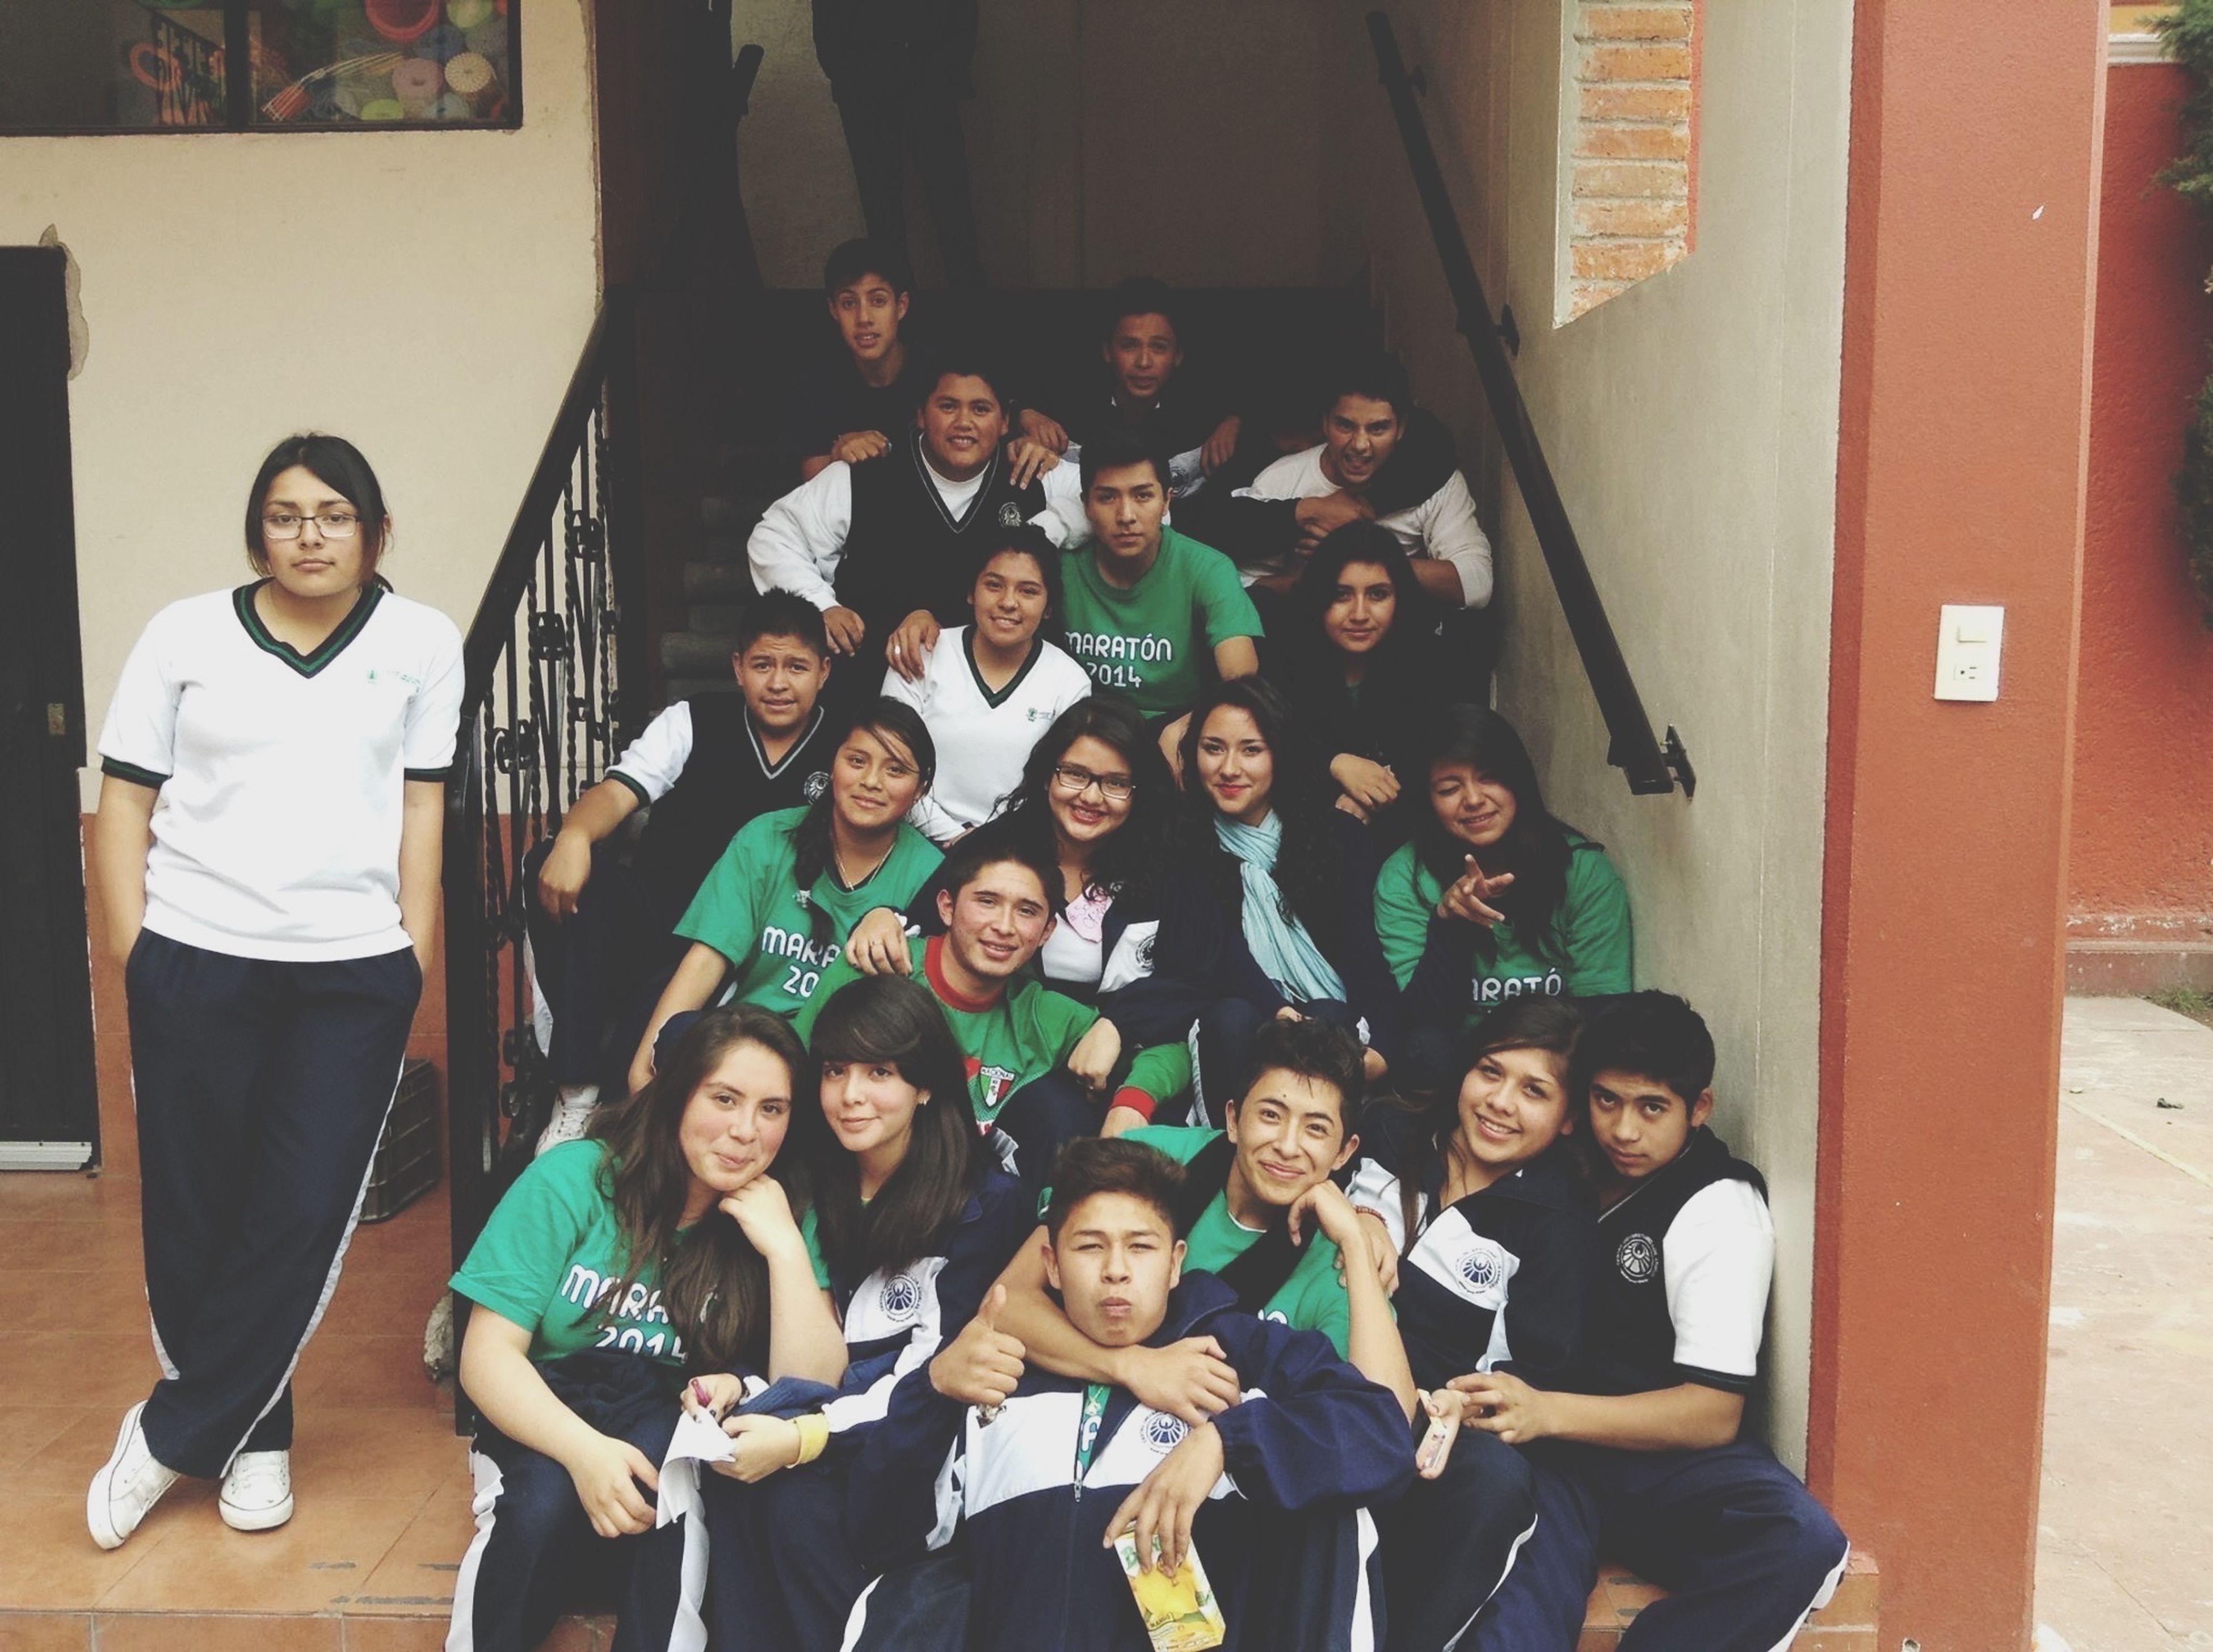 3ro BG el mejor grupo Equipoverde✅ 3er Lugar 👌 Escuela